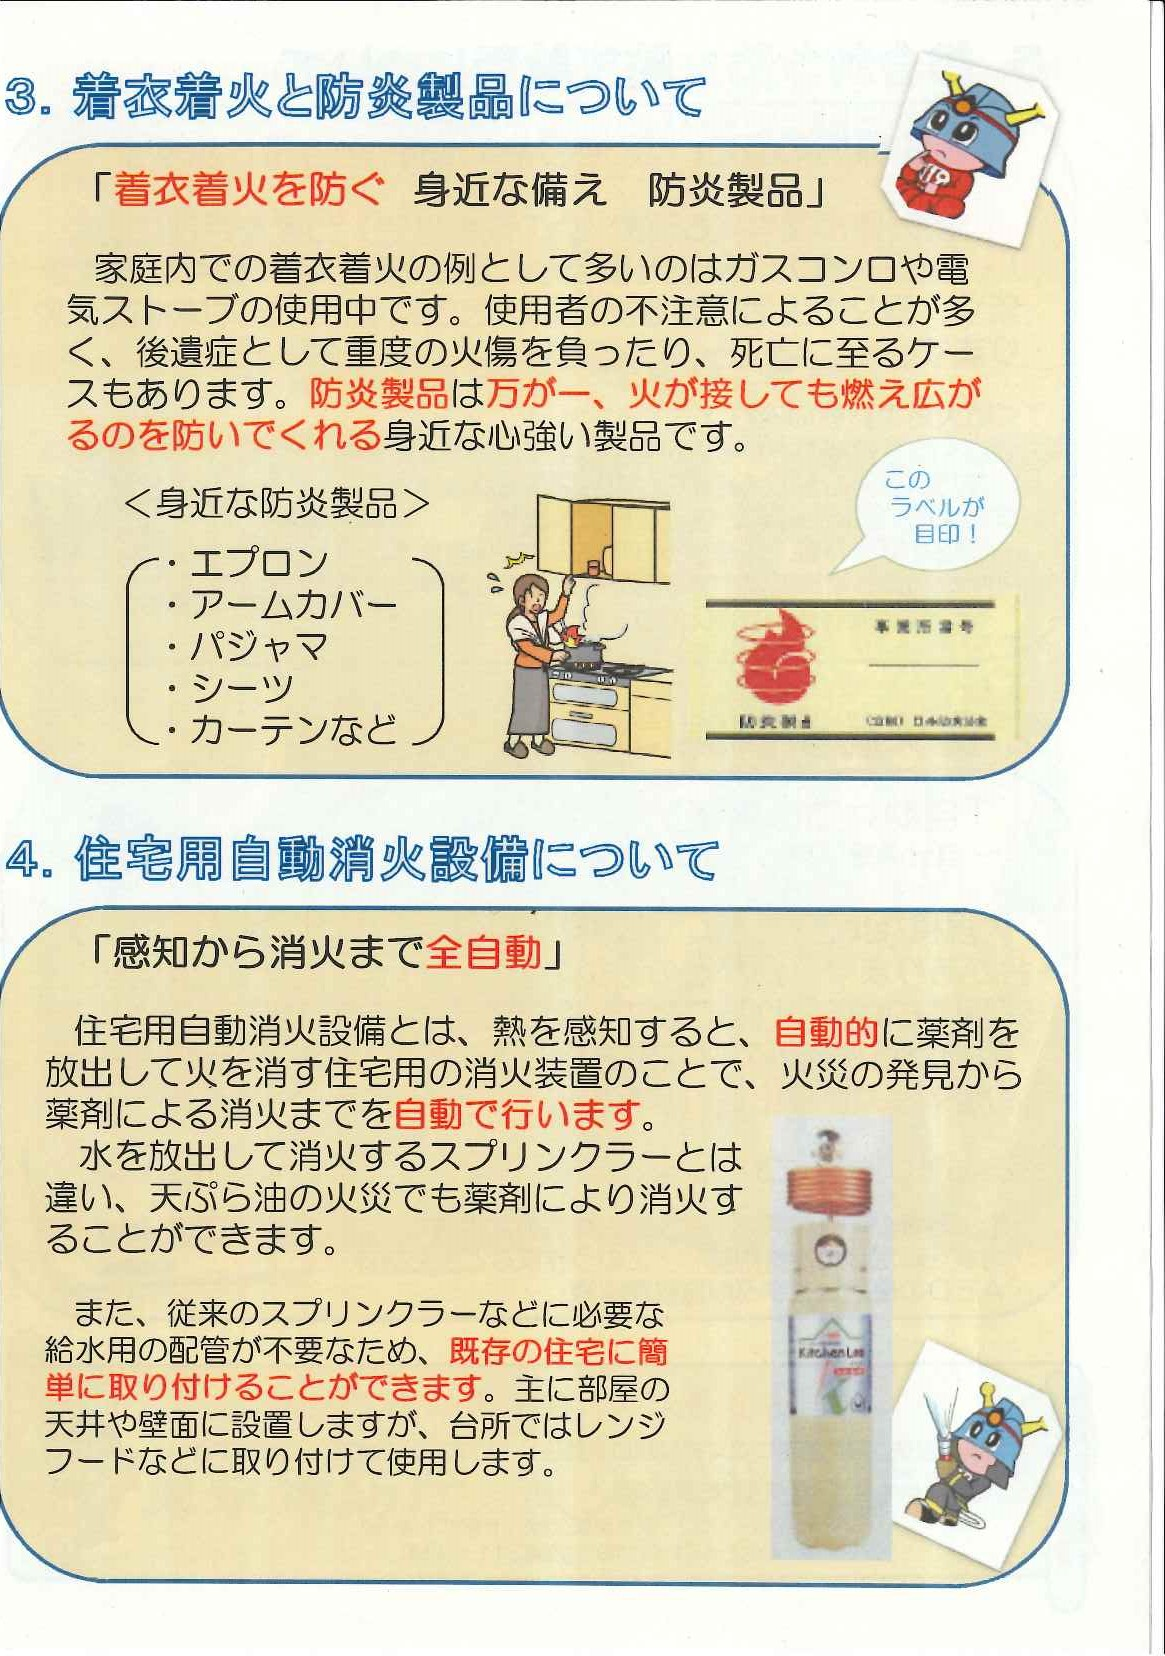 H261017消防防災推進項目配布資料 (2)